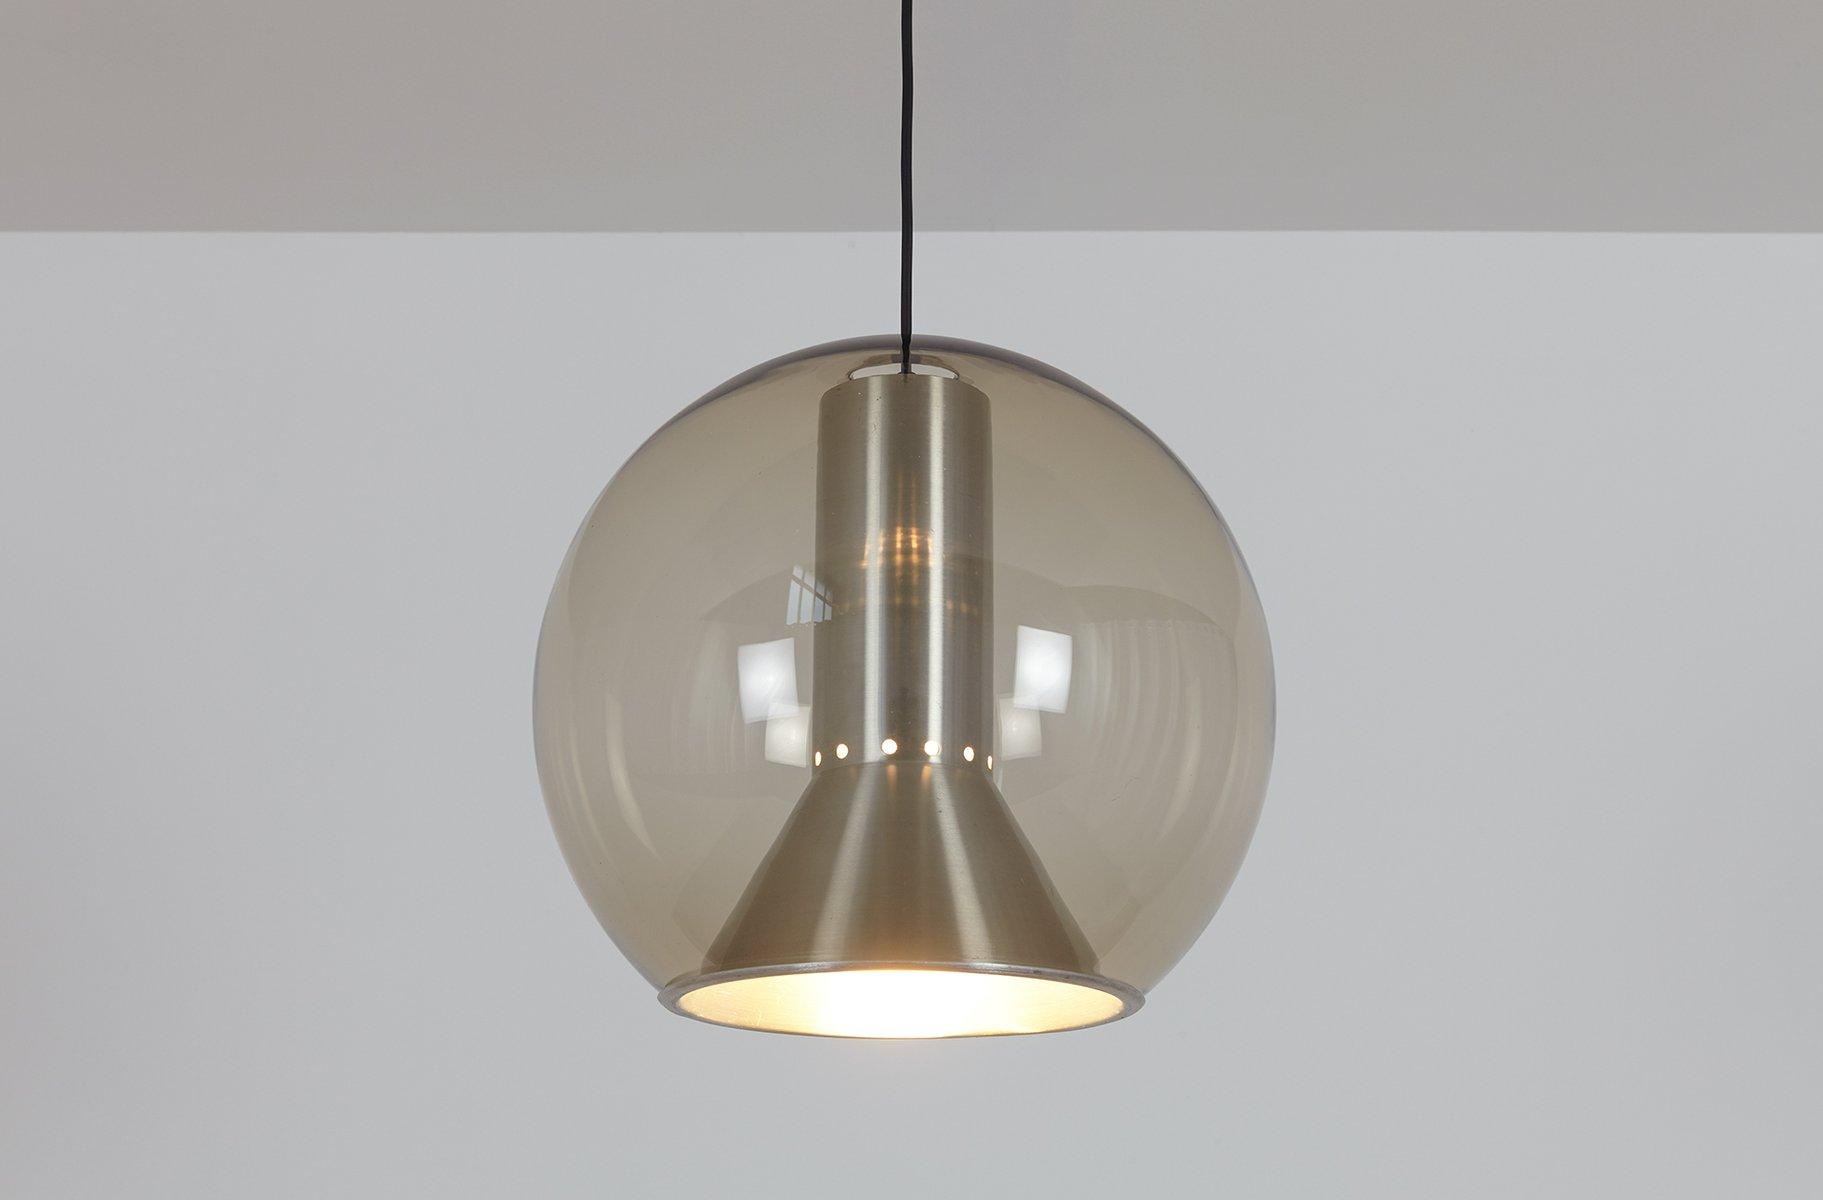 gro e vintage kugel h ngelampe von frank ligtelijn f r raak bei pamono kaufen. Black Bedroom Furniture Sets. Home Design Ideas